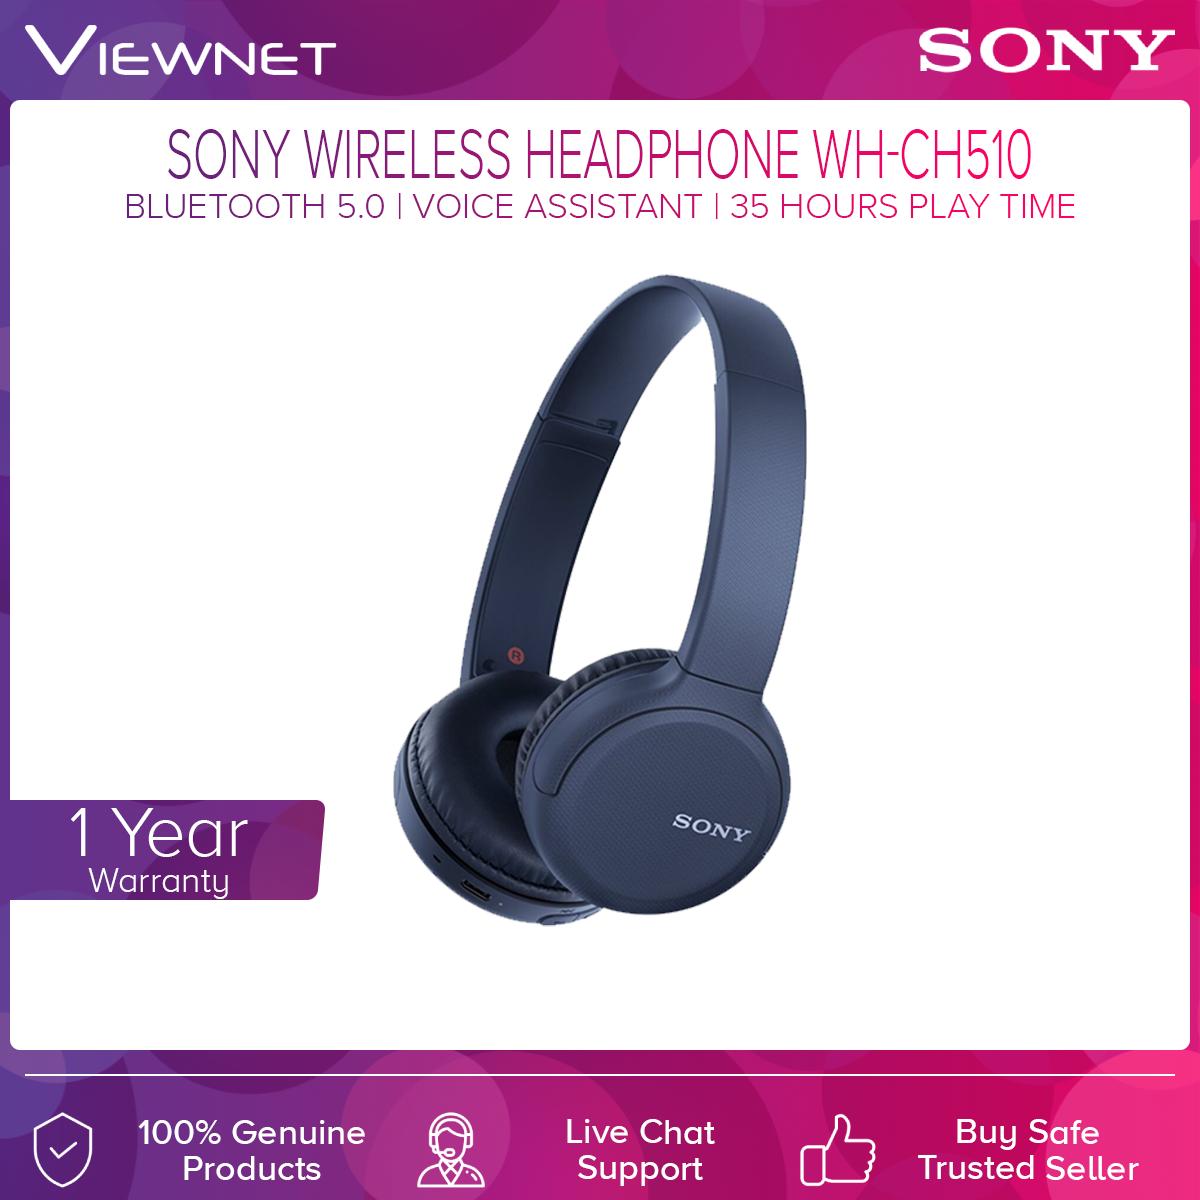 Sony WH-CH510 Wireless Bluetooth Headphones 35Hours battery life 30mm Driver unit Lightweight Bluetooth wireless